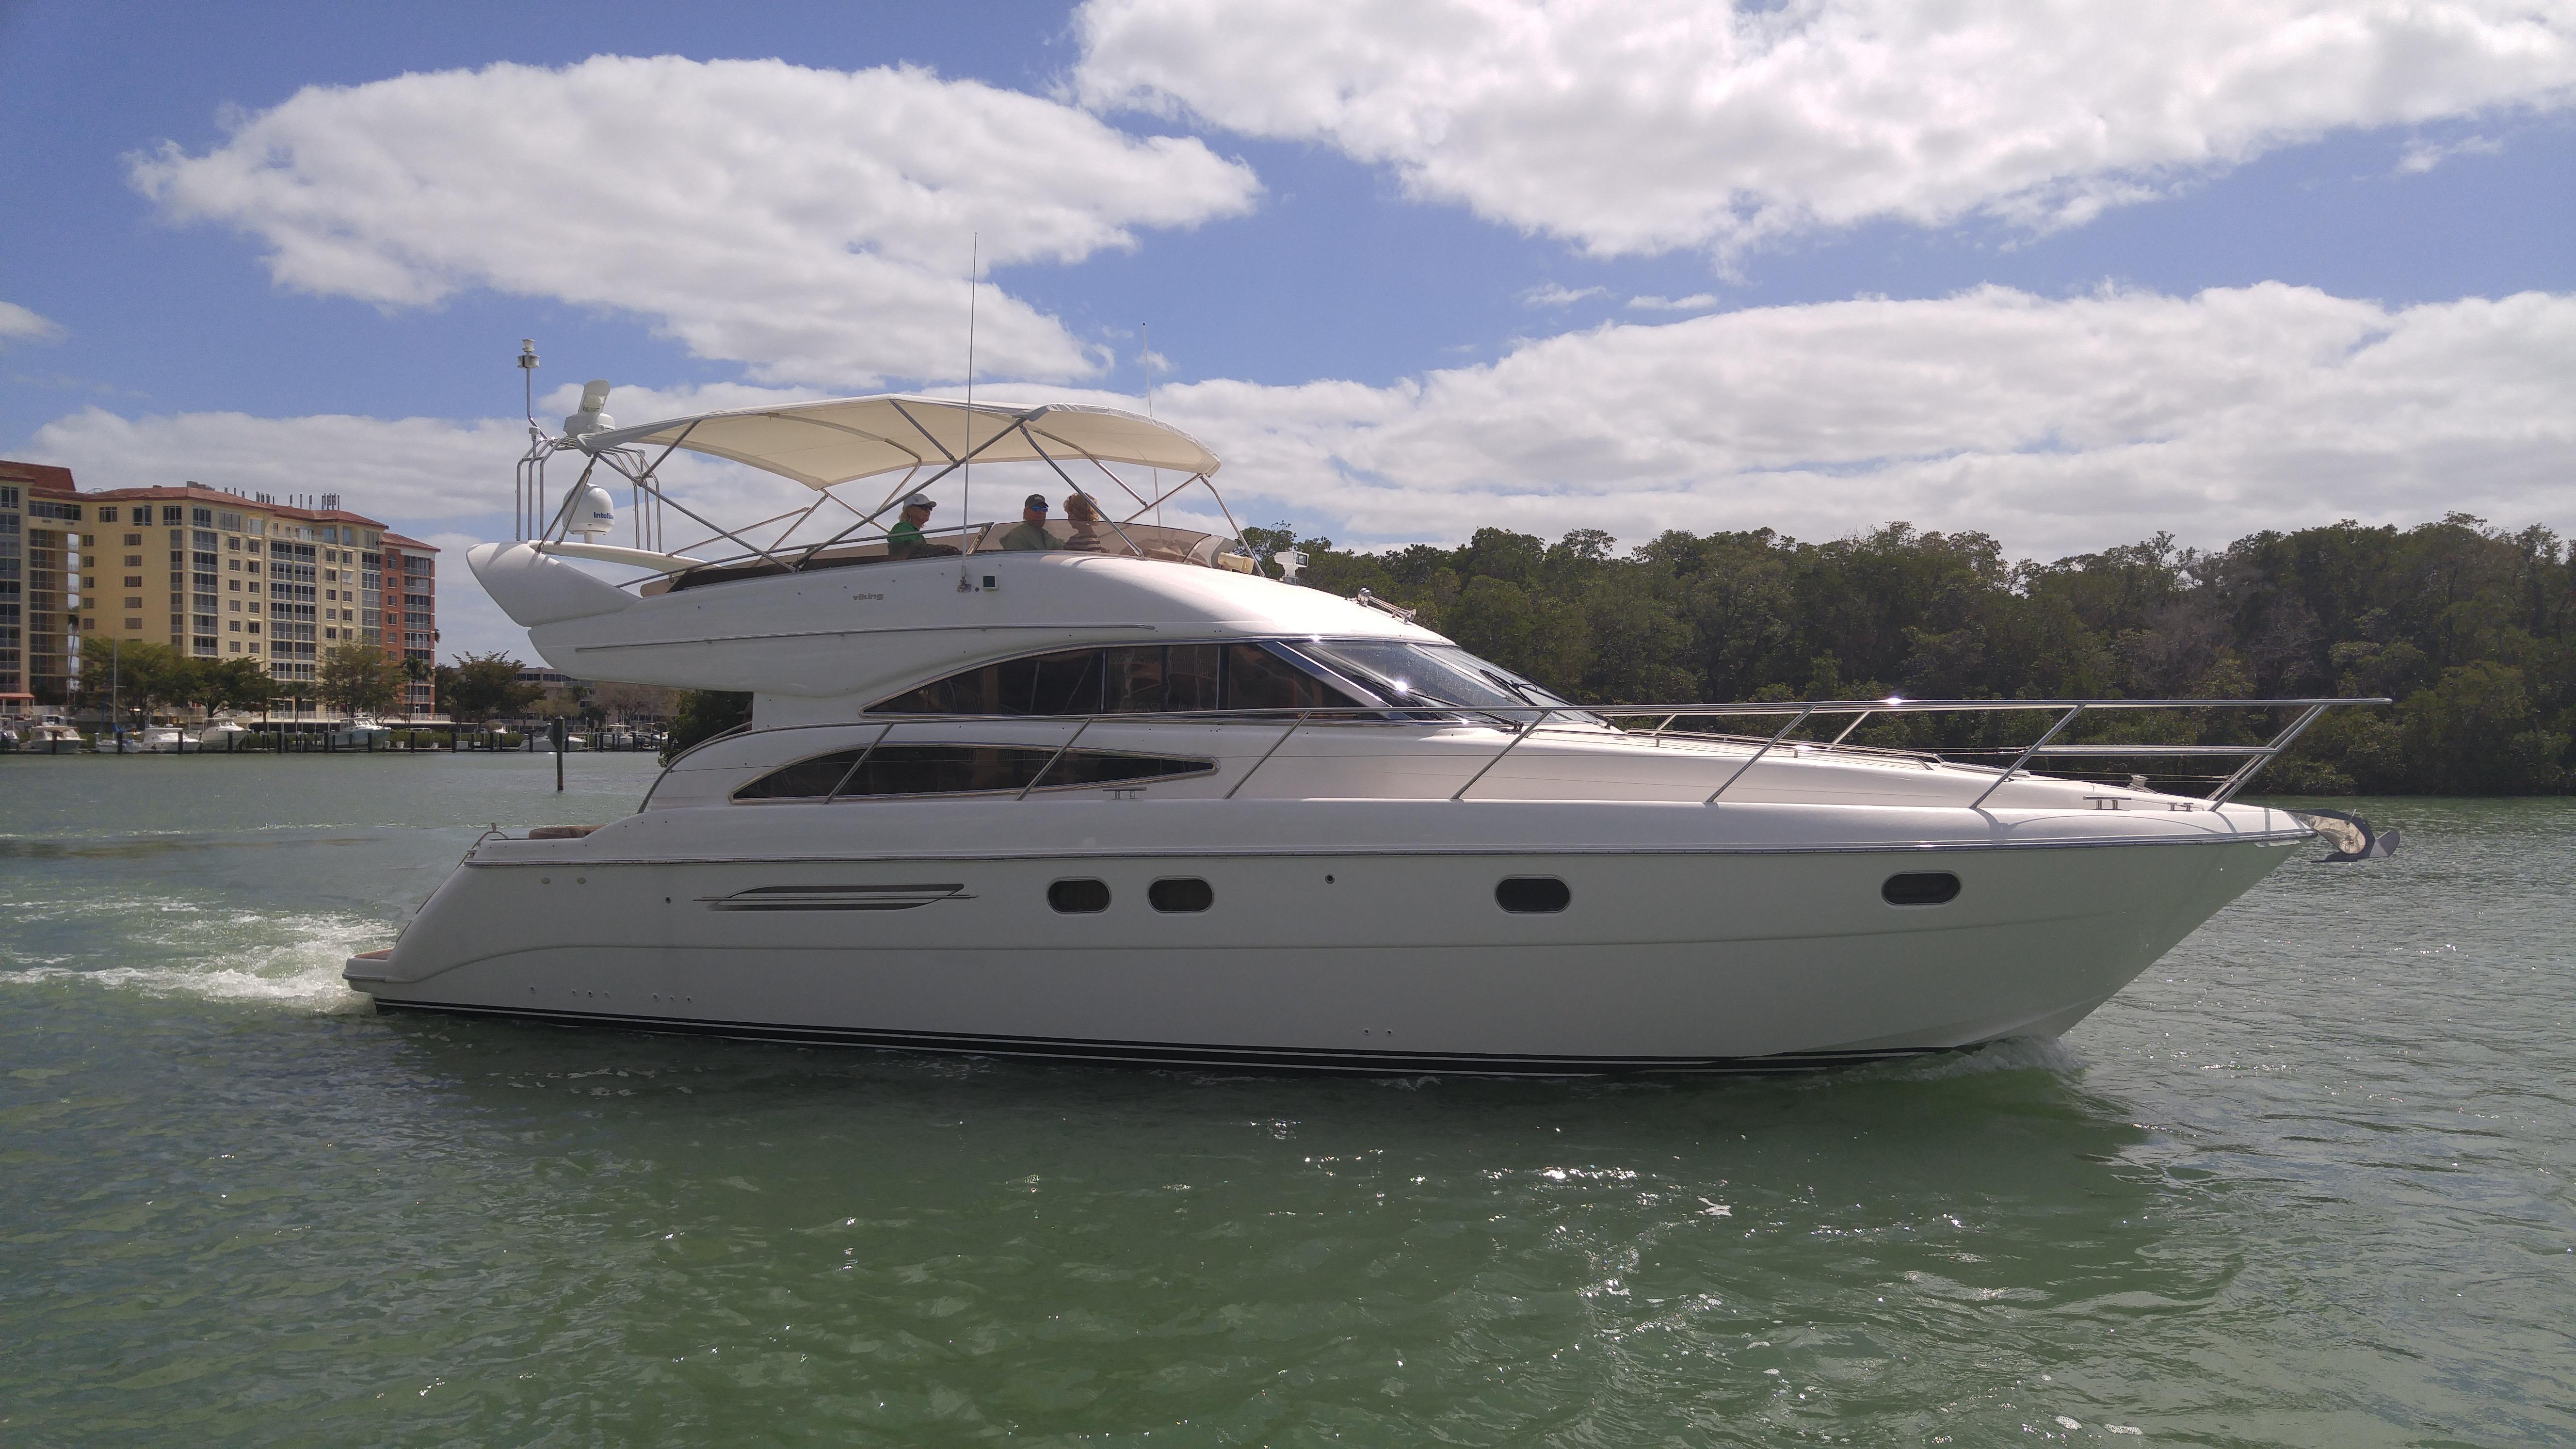 2004 princess viking 50 flybridge for sale for 50 ft motor yachts for sale